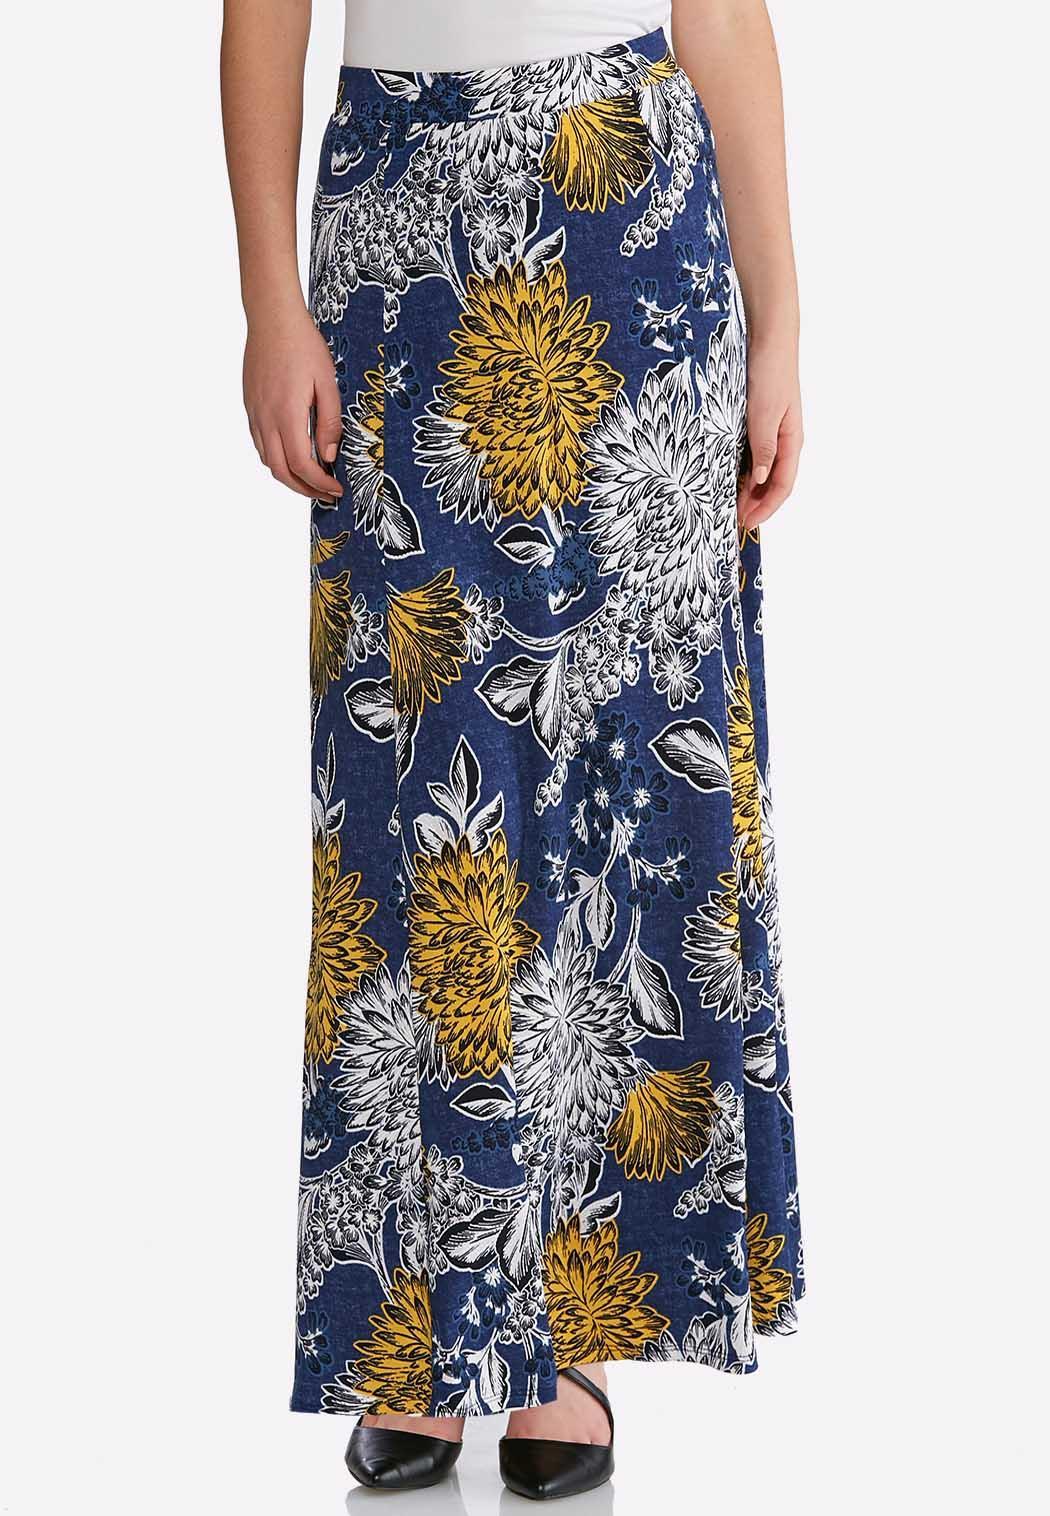 72910894eb Plus Size Puff Floral Maxi Skirt Maxi Cato Fashions